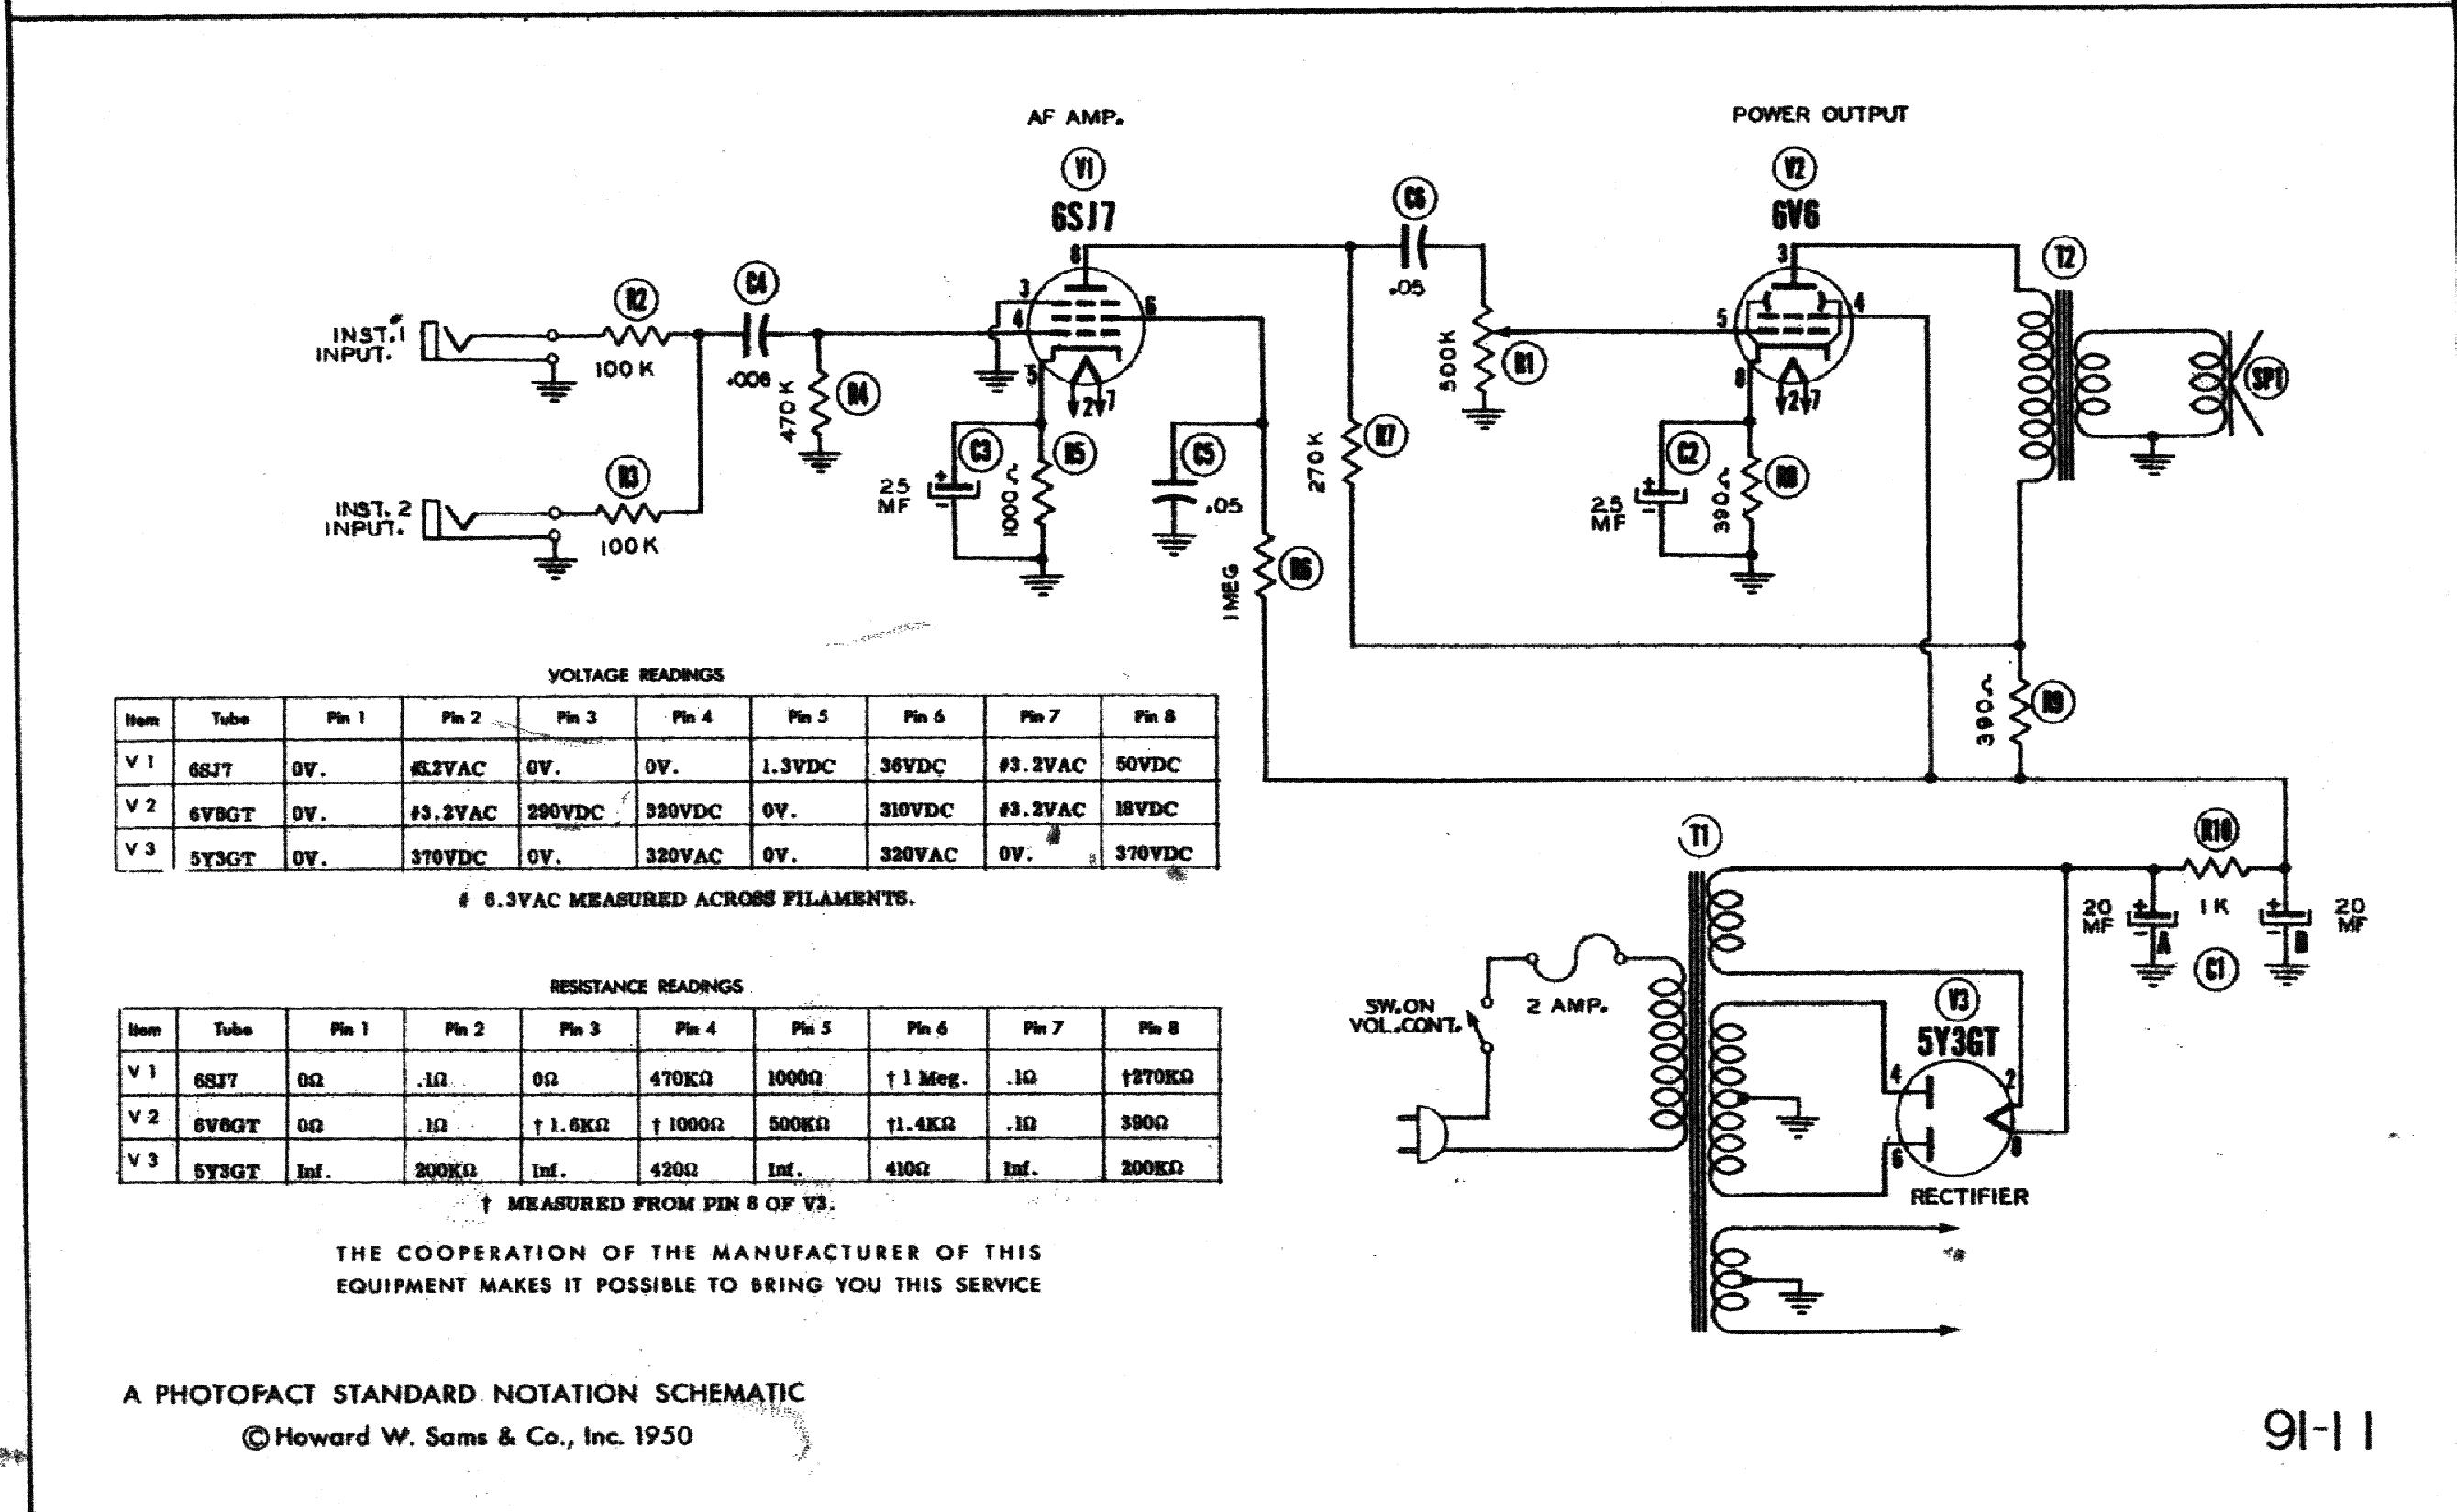 SILVERTONE 1301 SCH service manual (1st page)